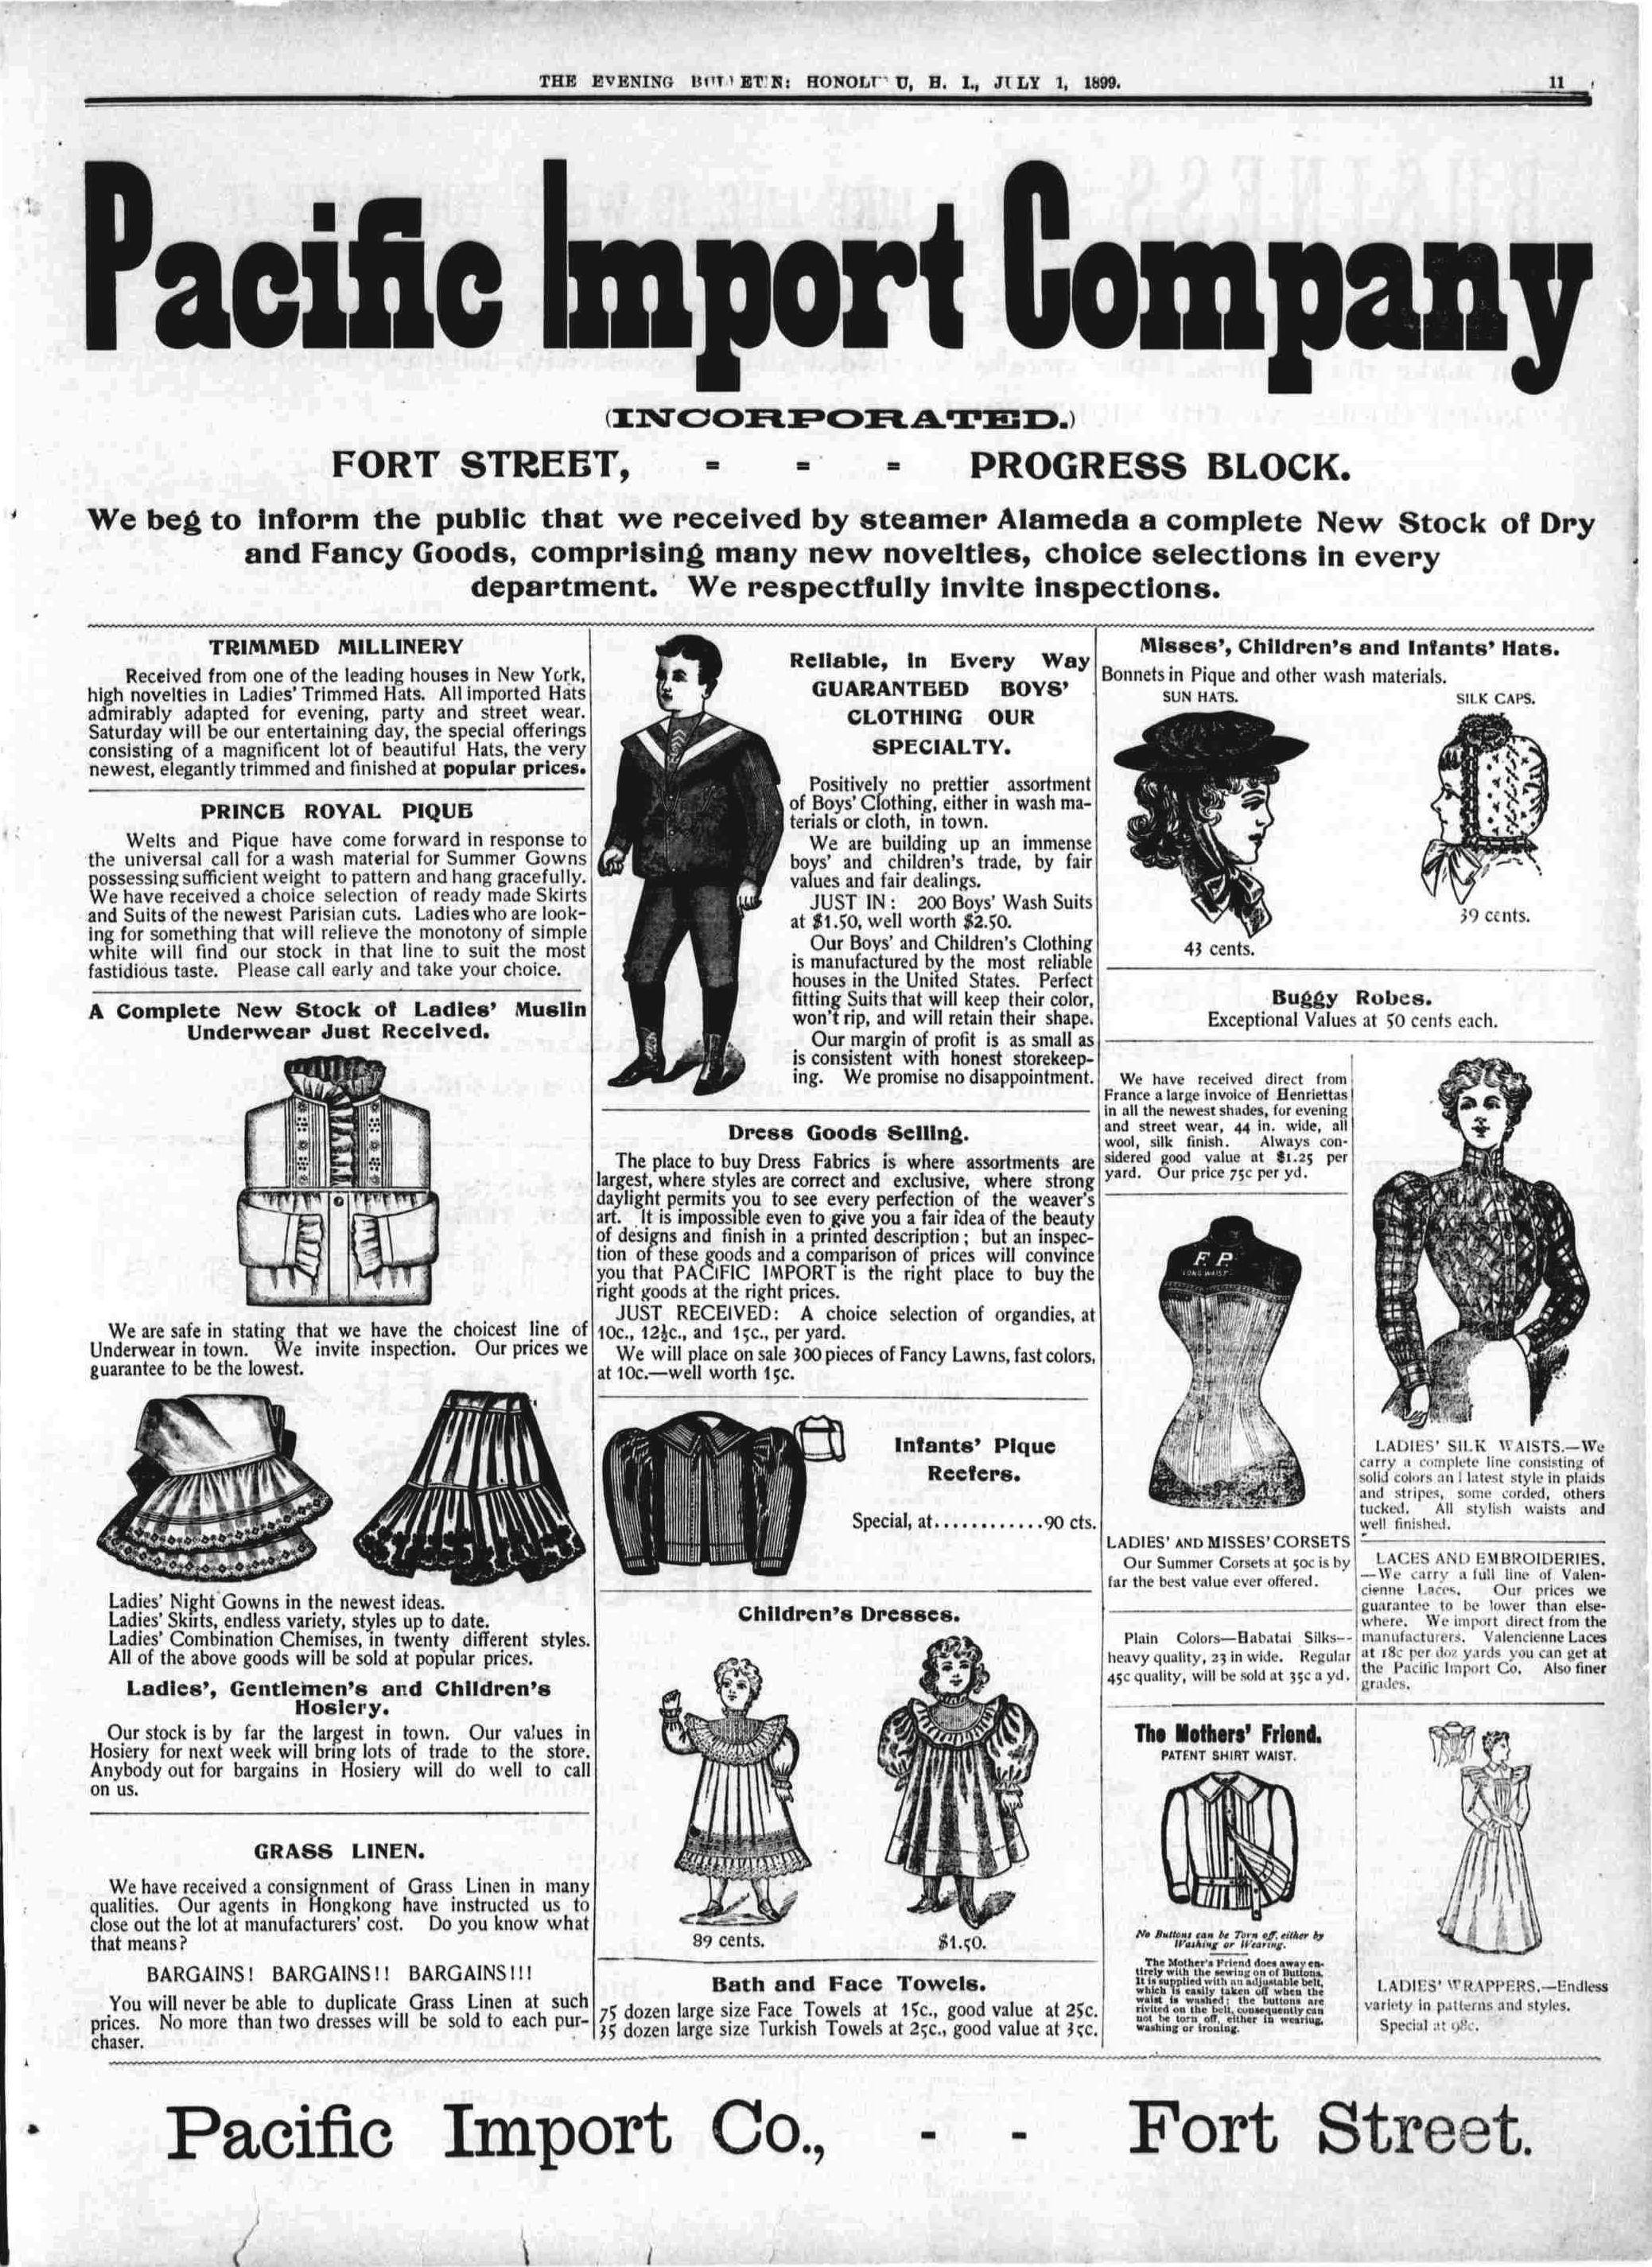 Fashion In Hawaii Newspaper Advertisements